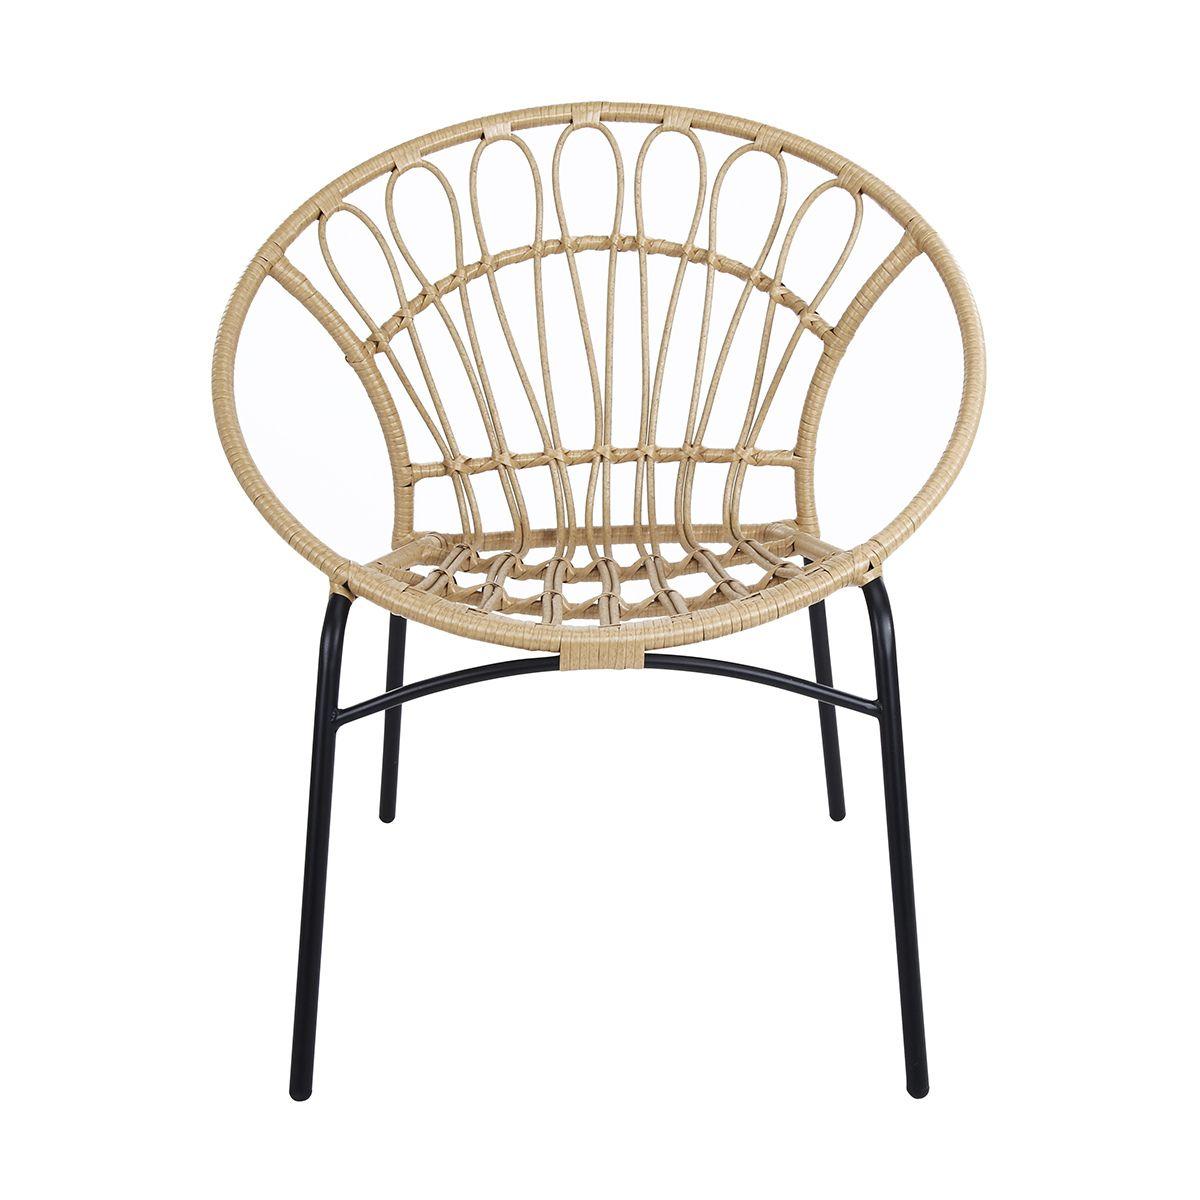 Rattan Look Chair Natural Kmart Outdoor Furniture